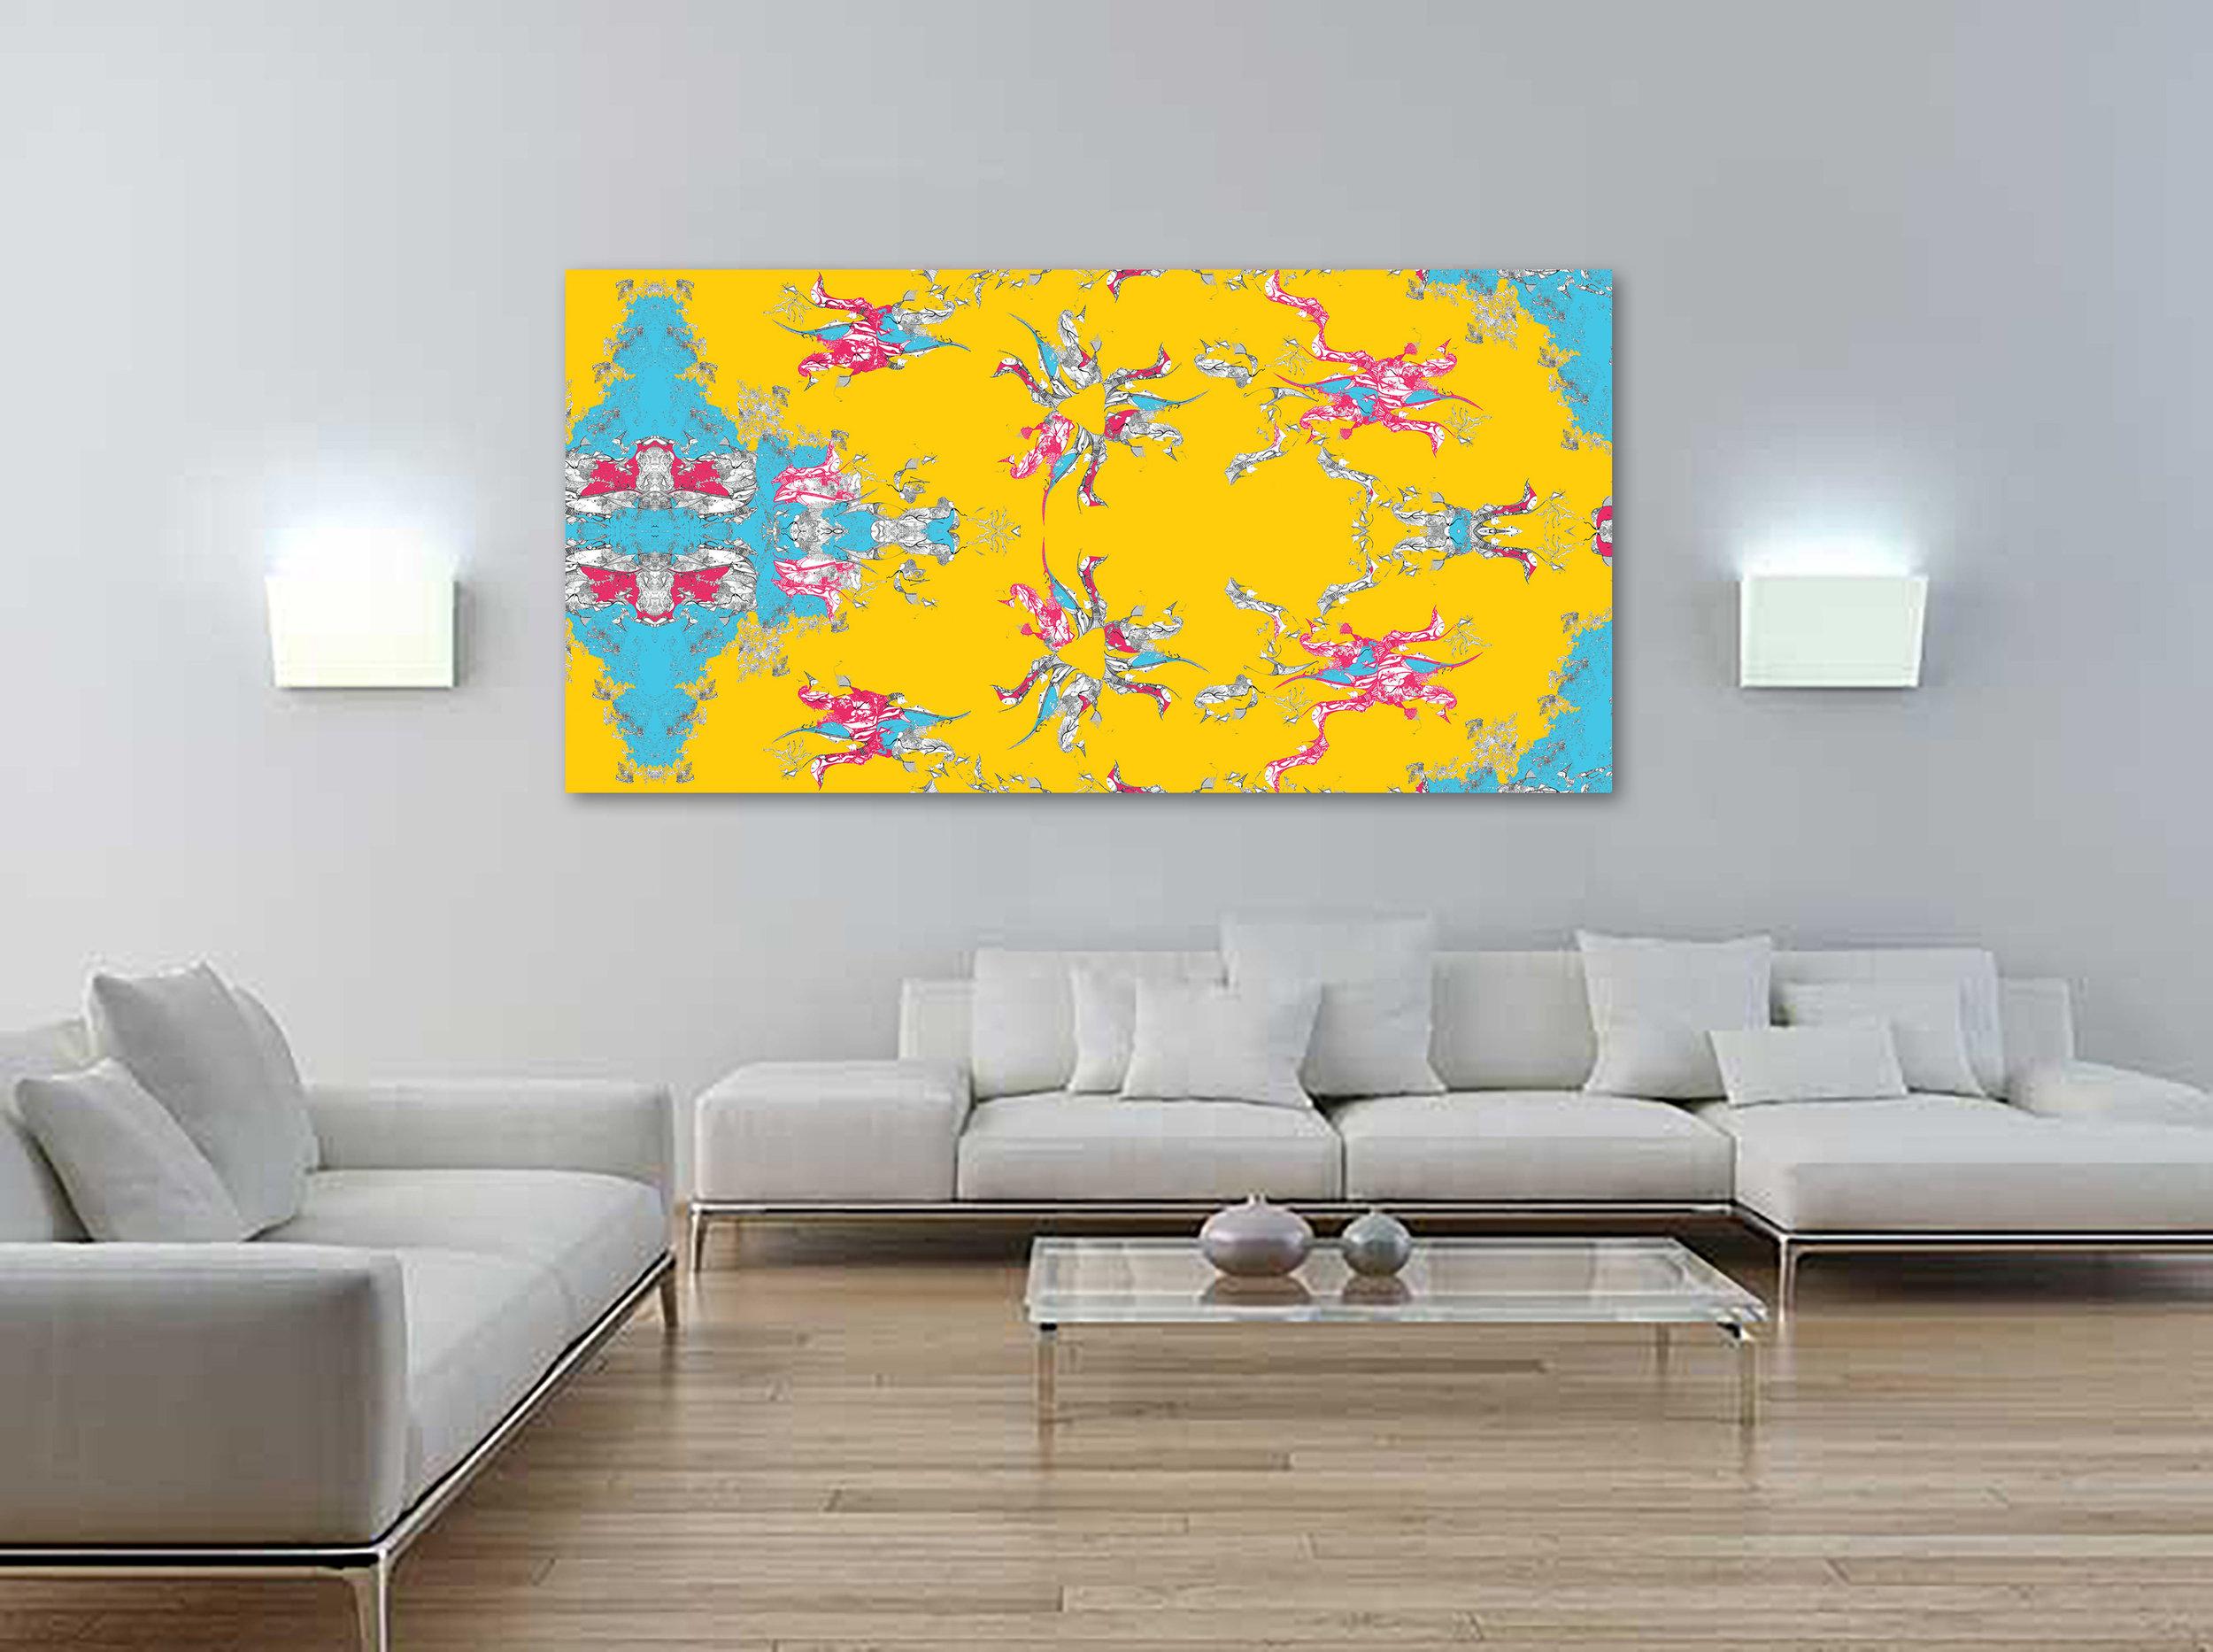 beJOYed_InteriorPreview_Livingroom03.jpg